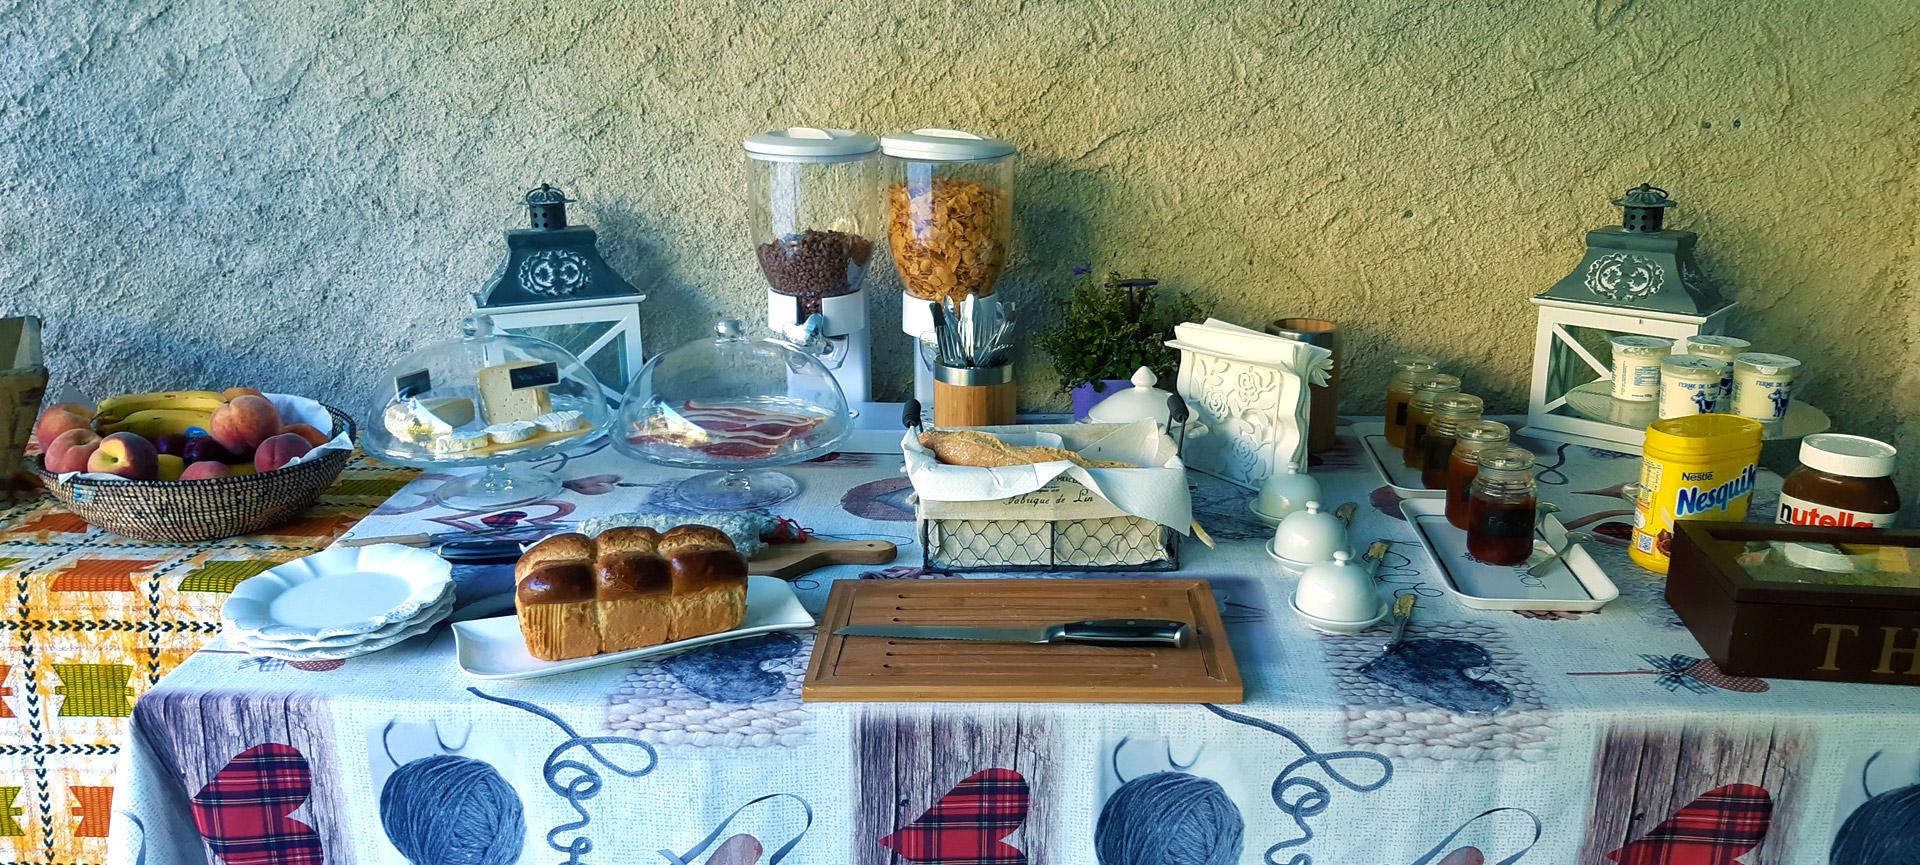 bed and breakfast le moulin de benedicty gites de france